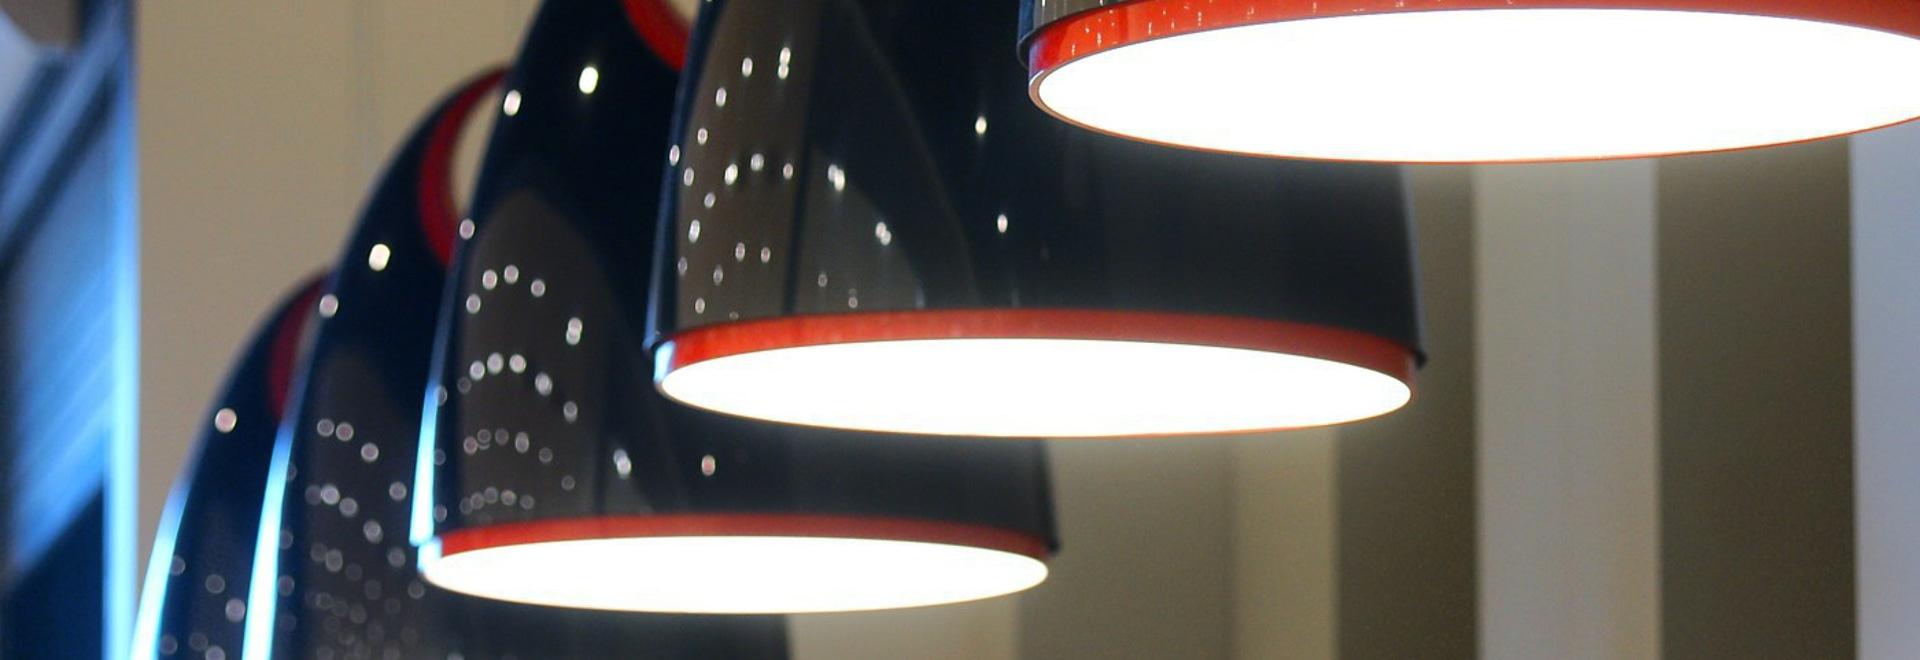 Flash&DQ HB886 luminaire at GIKS Roelselare in Belgium